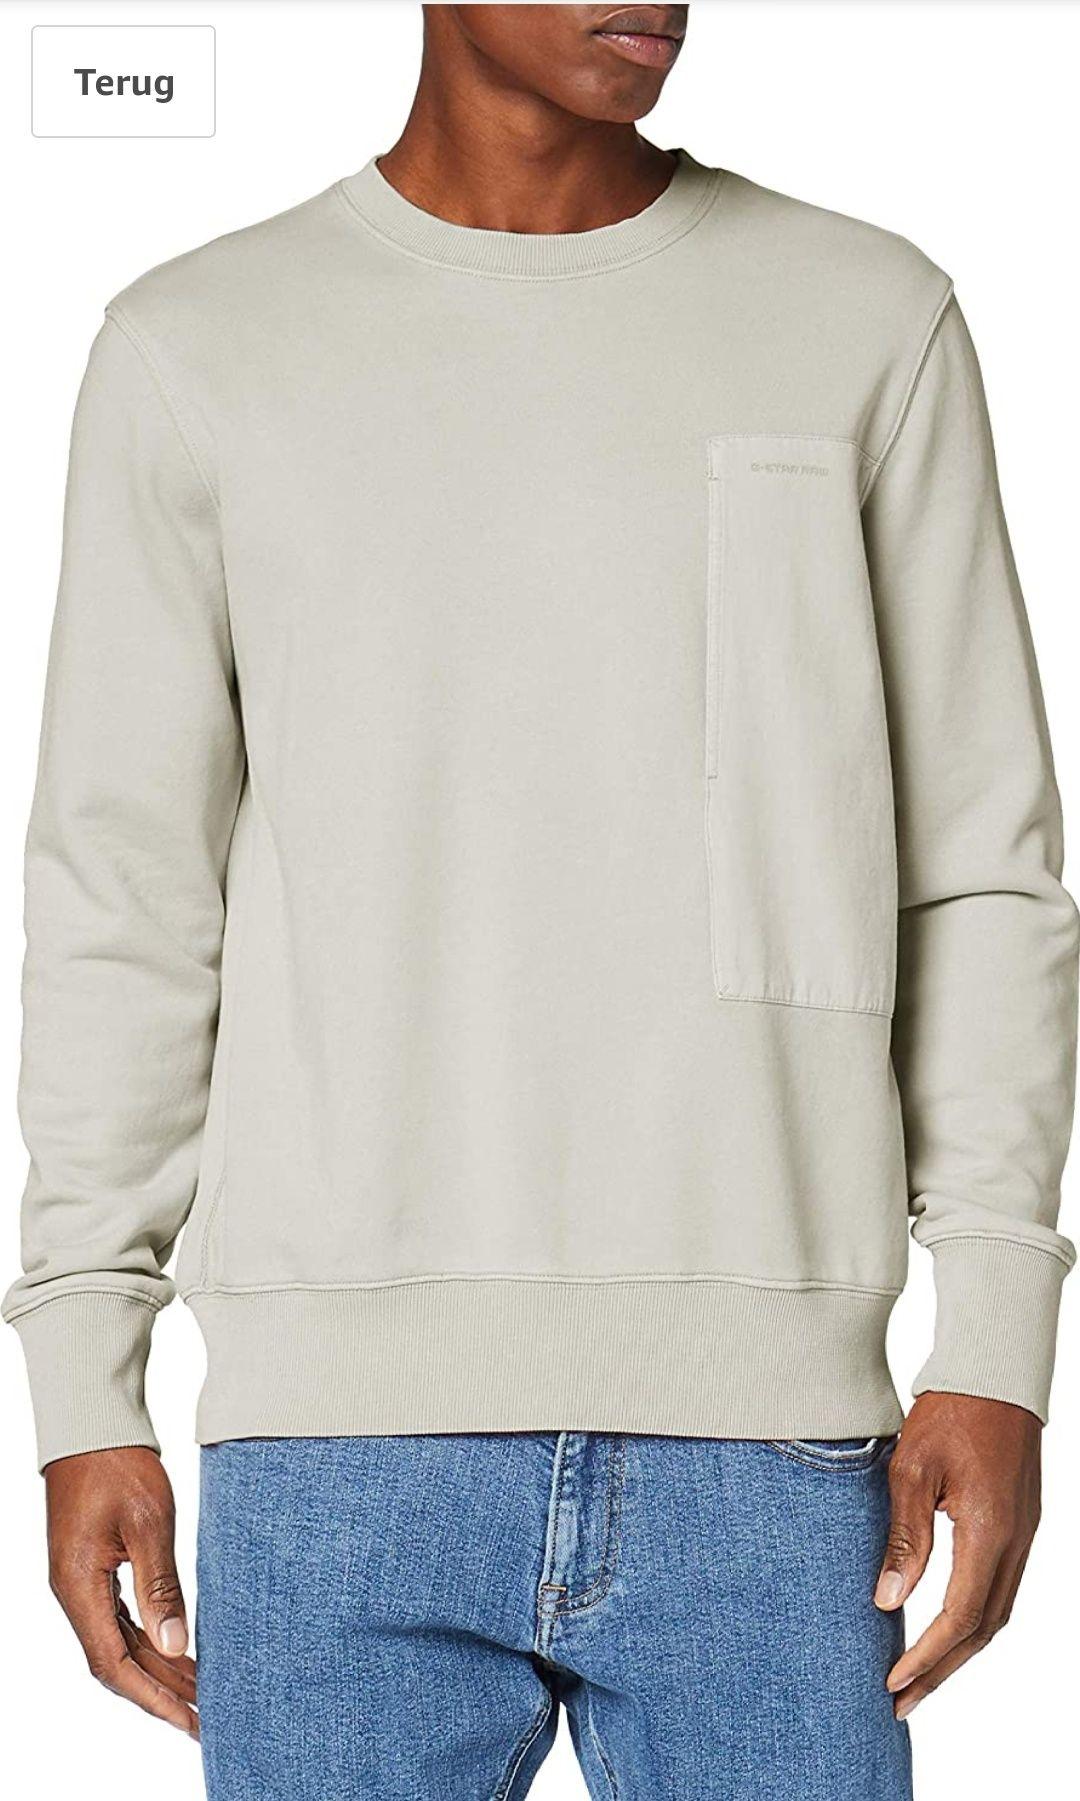 G-Star Raw Pocket Sweater @ amazon.nl